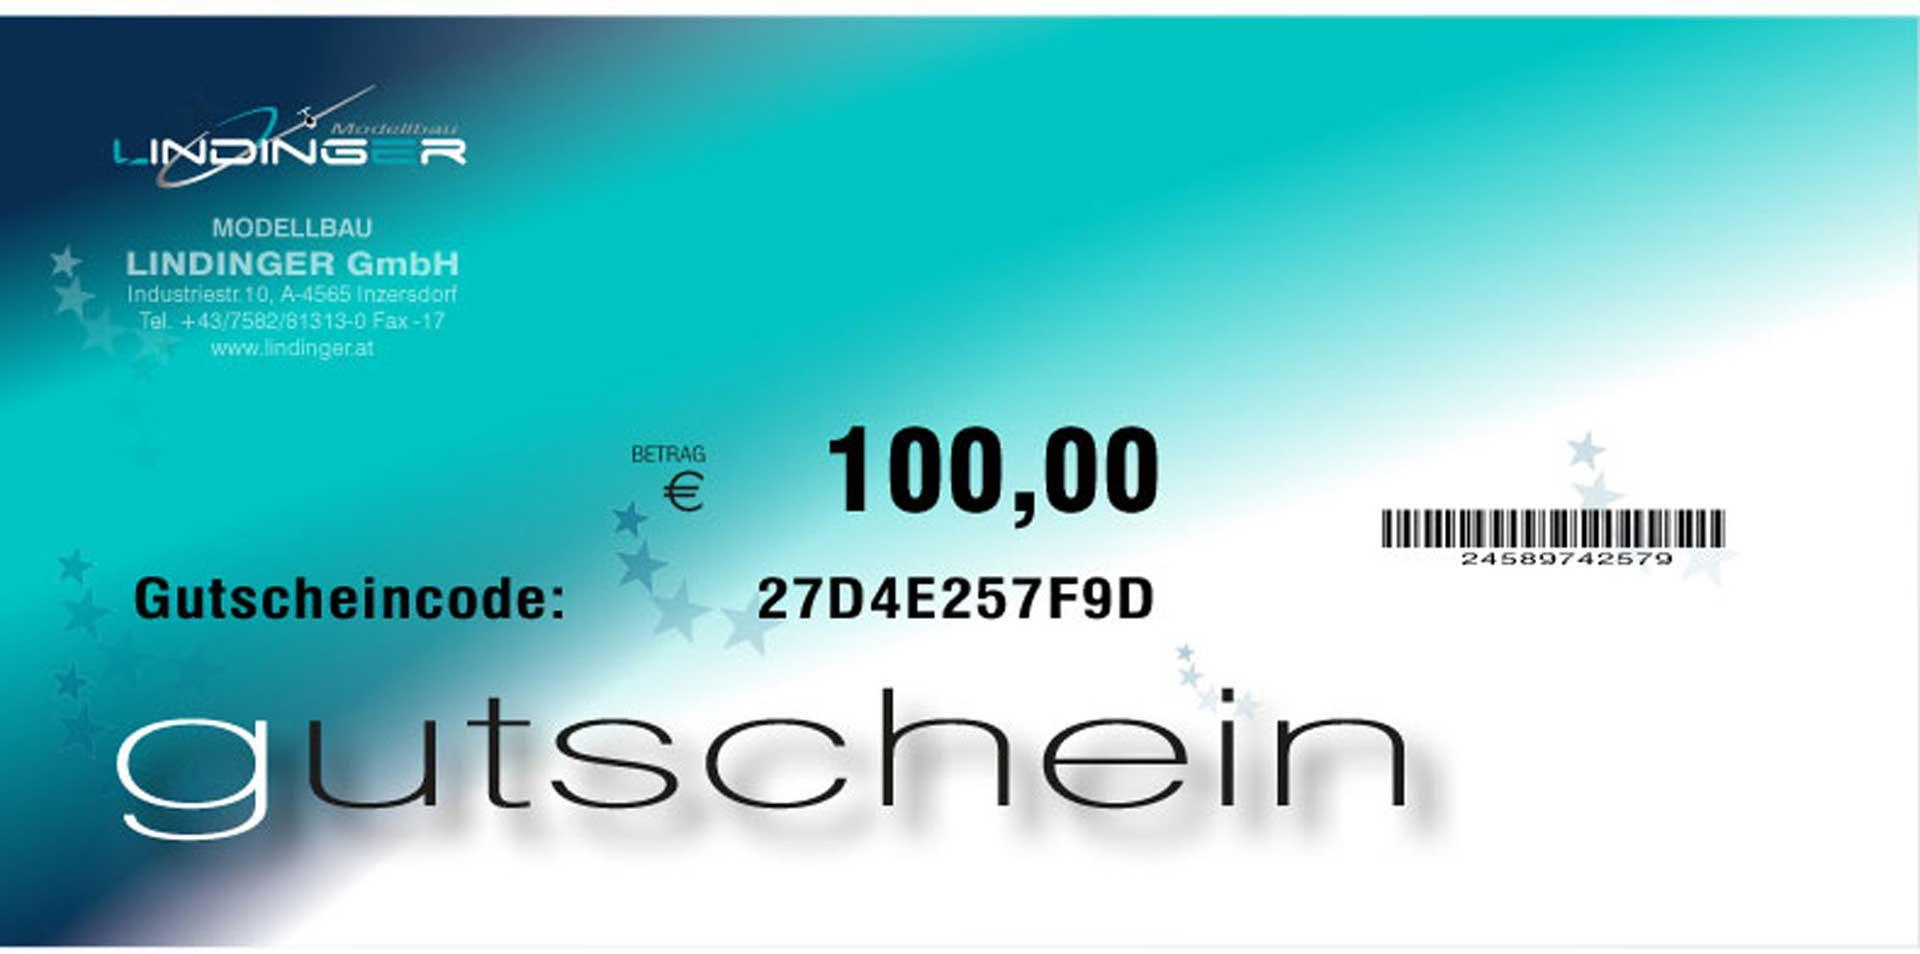 MODELLBAU LINDINGER E-VOUCHER LINDINGER 100,- EURO PDF PER E-MAIL